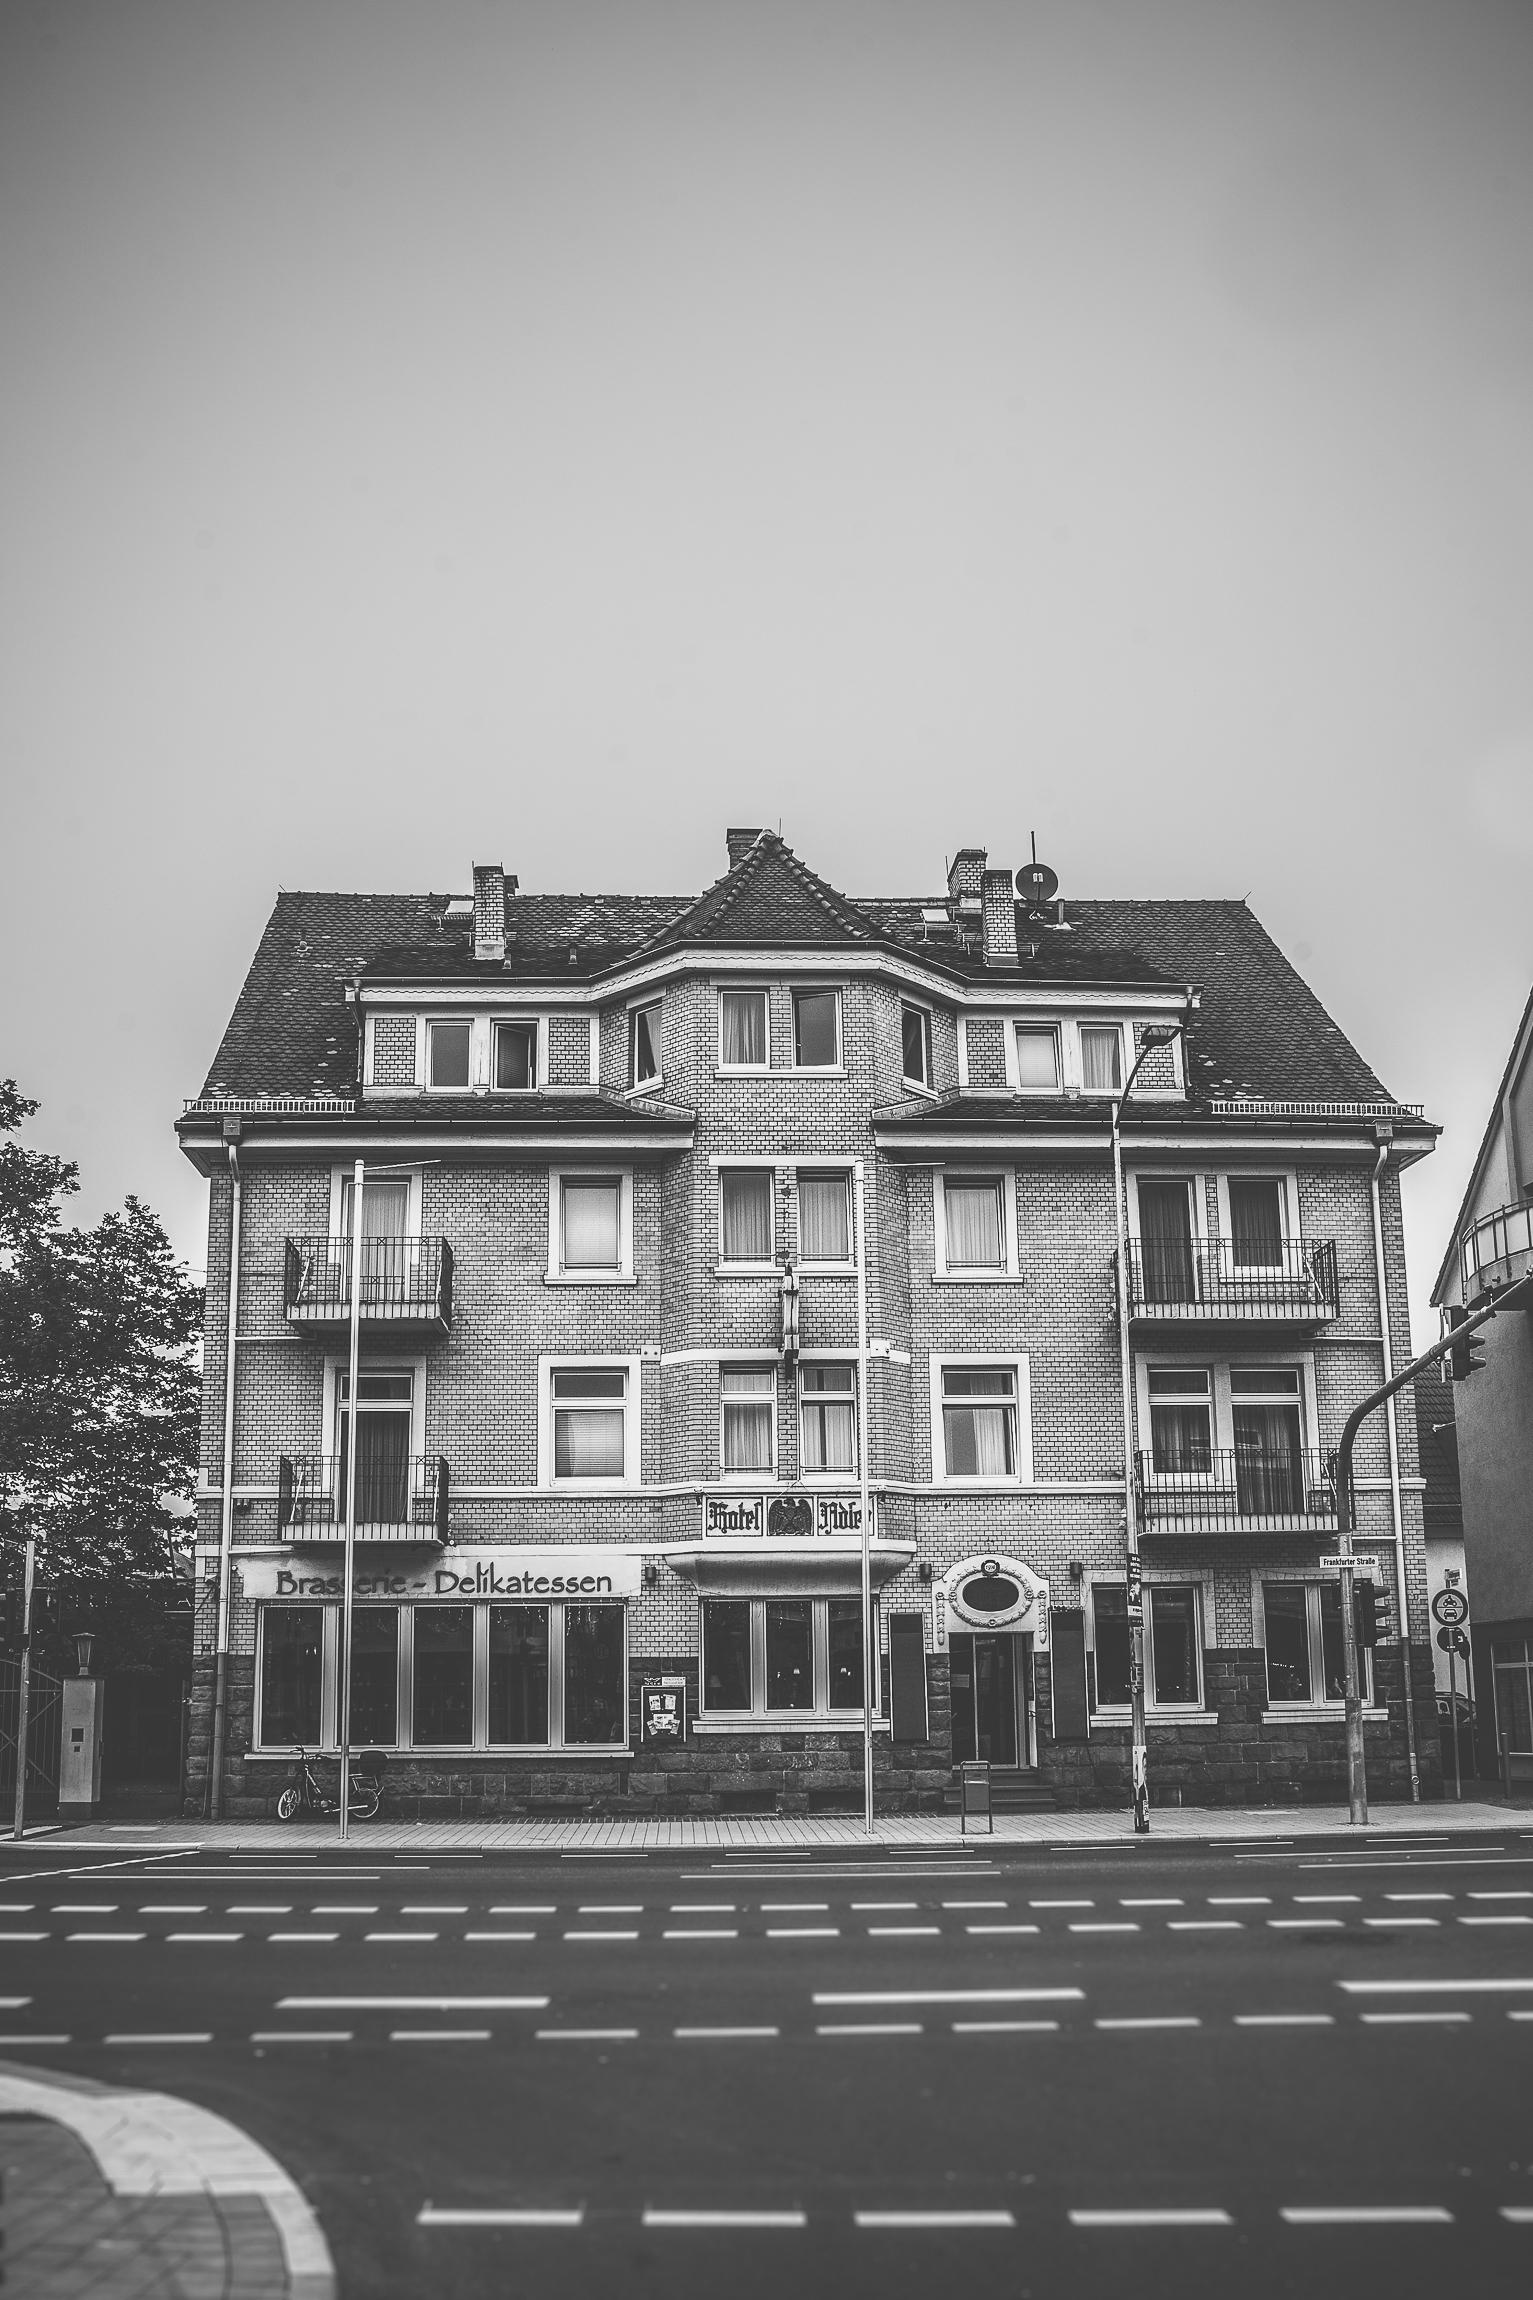 Adler Rüsselsheim